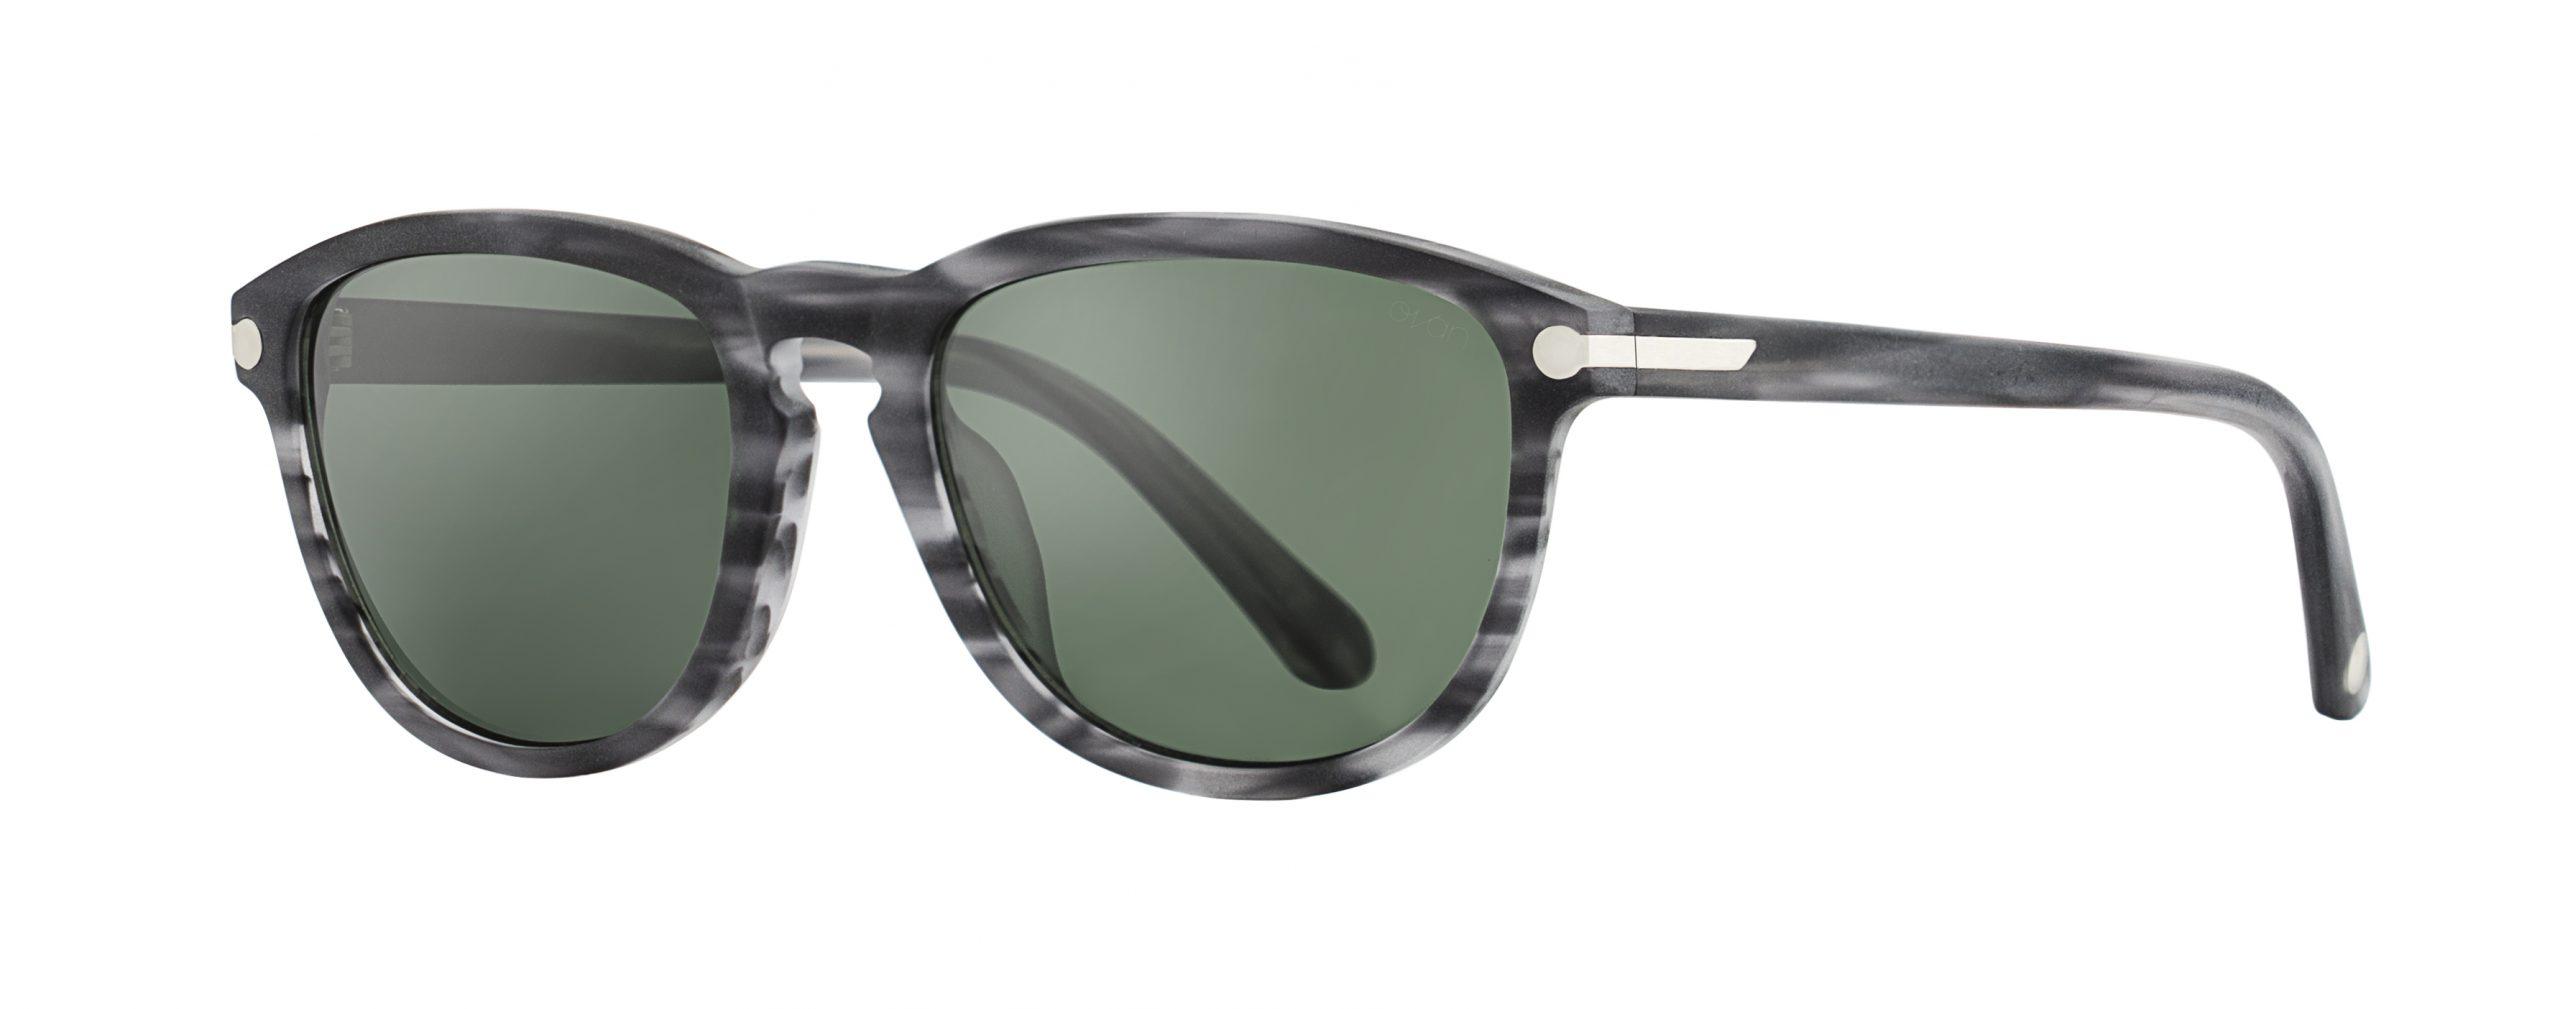 d6d4f7e1a7 Ovan Sunglasses SS18 Preview - Boardsport SOURCE